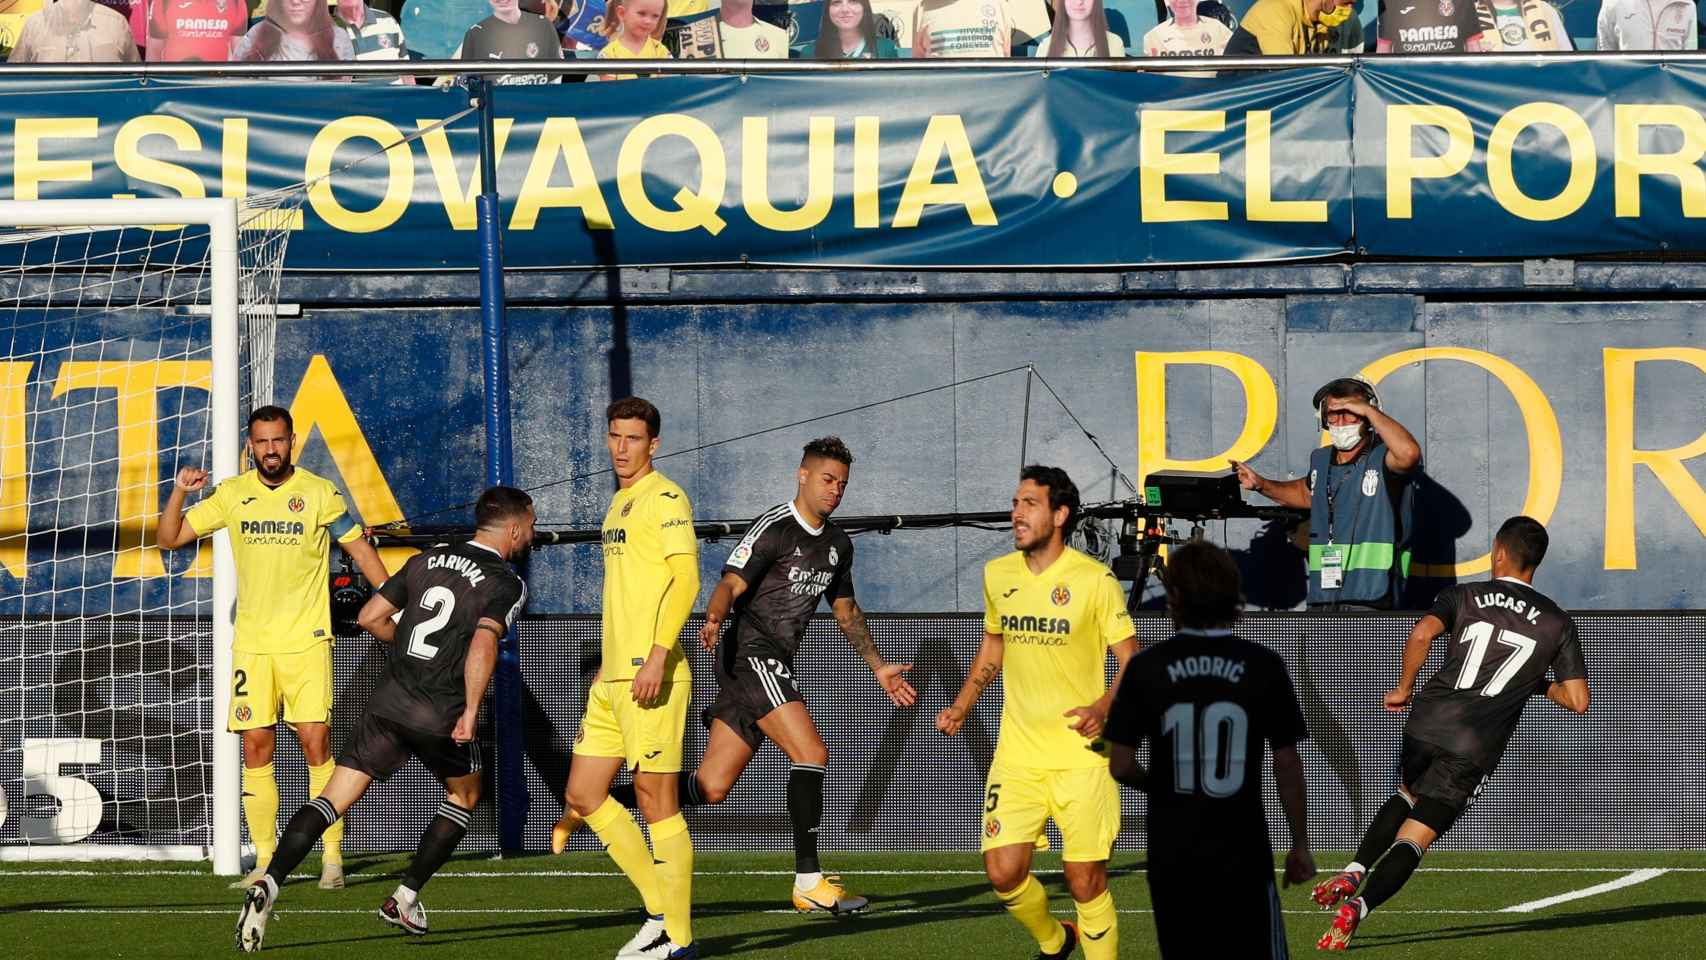 Mariano celebra su gol al Villarreal